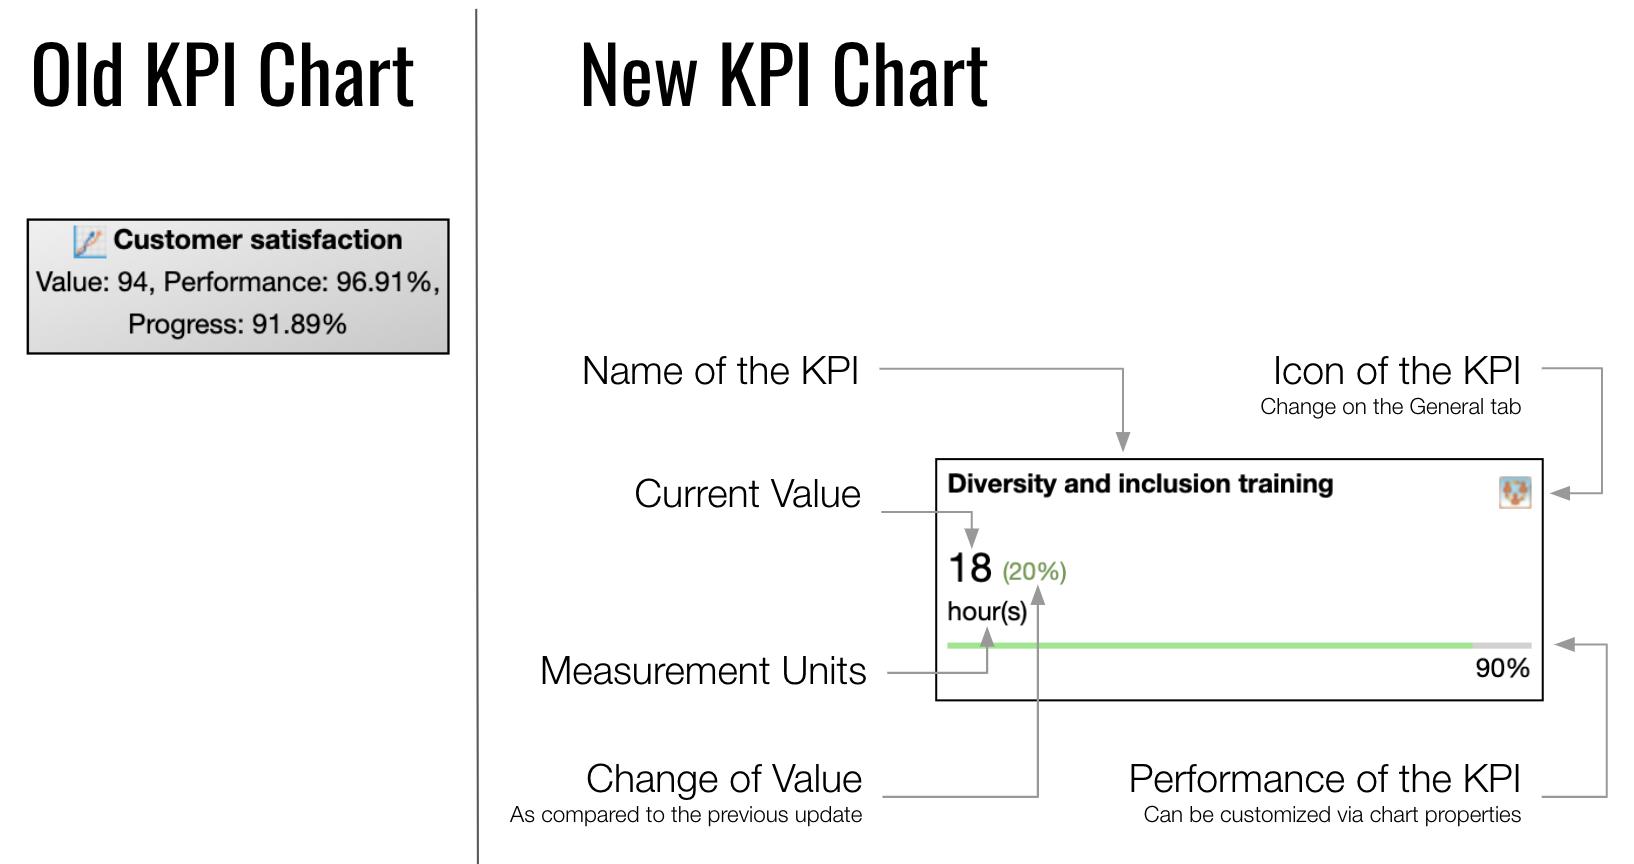 KPI Chart Old vs New